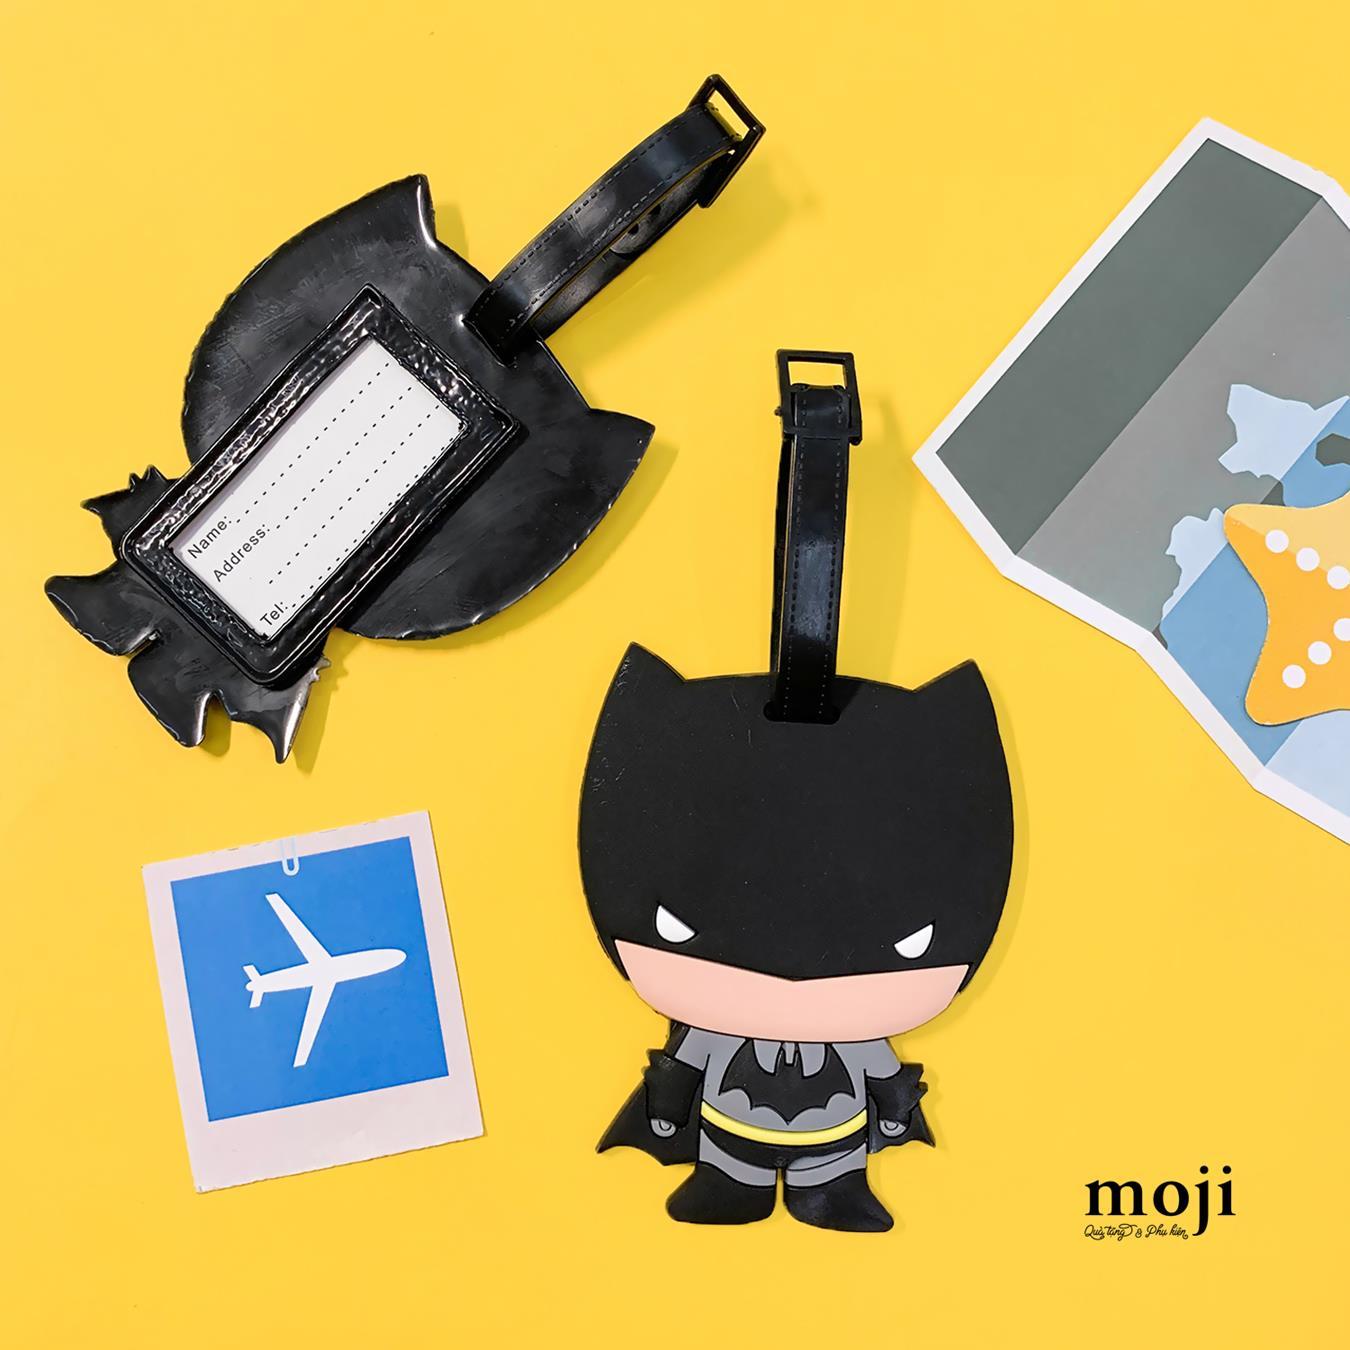 https://storage.googleapis.com/cdn.nhanh.vn/store/7534/psCT/20190504/13673513/Luggage_tag_Sieu_nhan_Batman_Baby_(19051012_bl).jpg